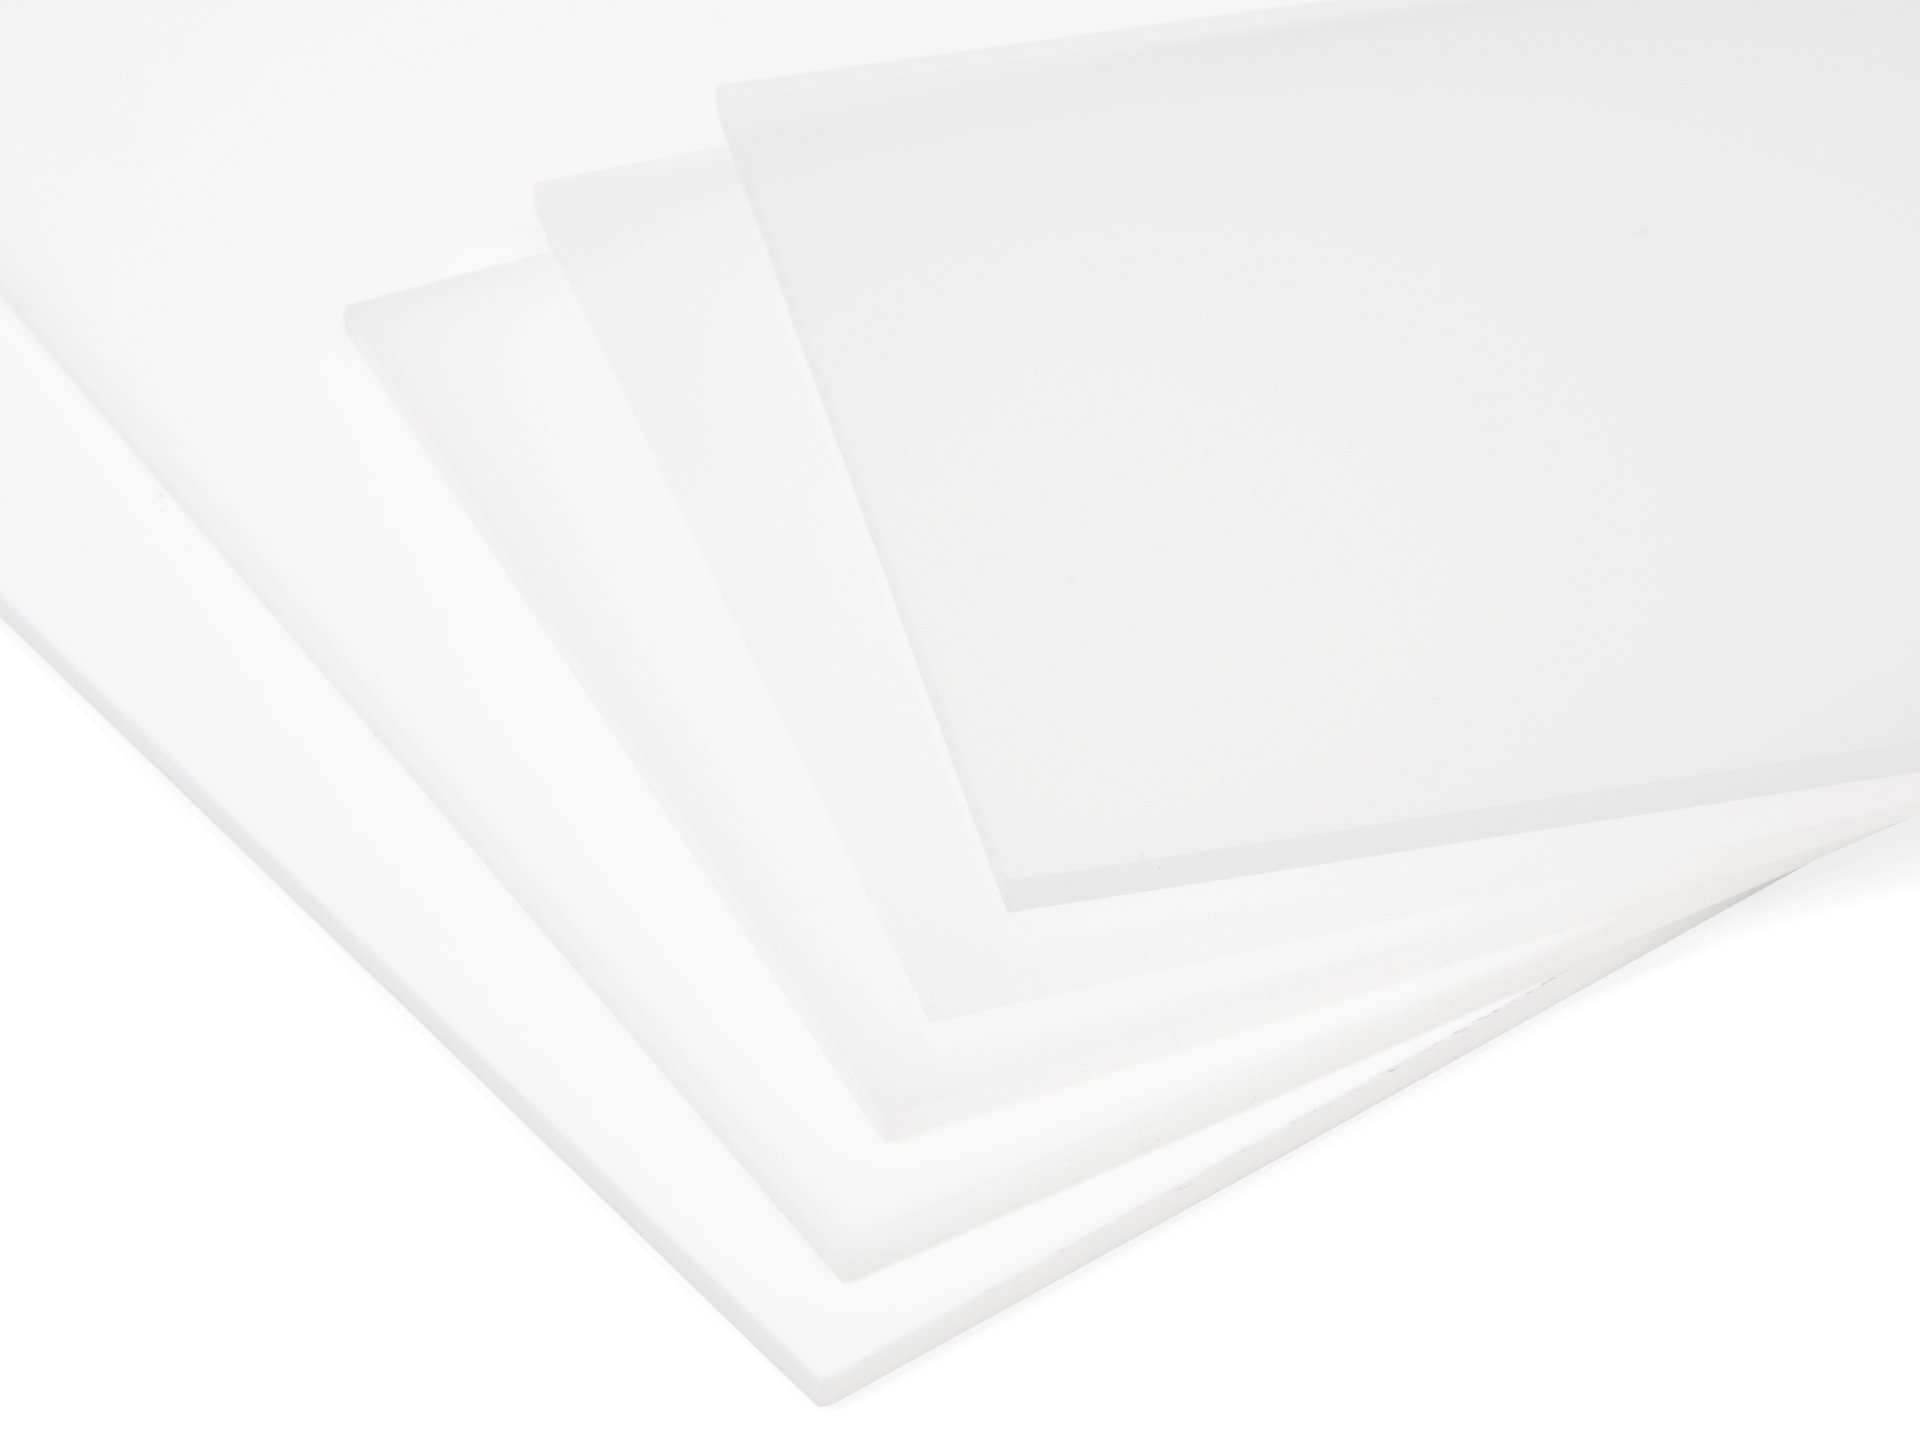 plastik glas platten gallery of lila platte x cm die with plastik glas platten beautiful. Black Bedroom Furniture Sets. Home Design Ideas